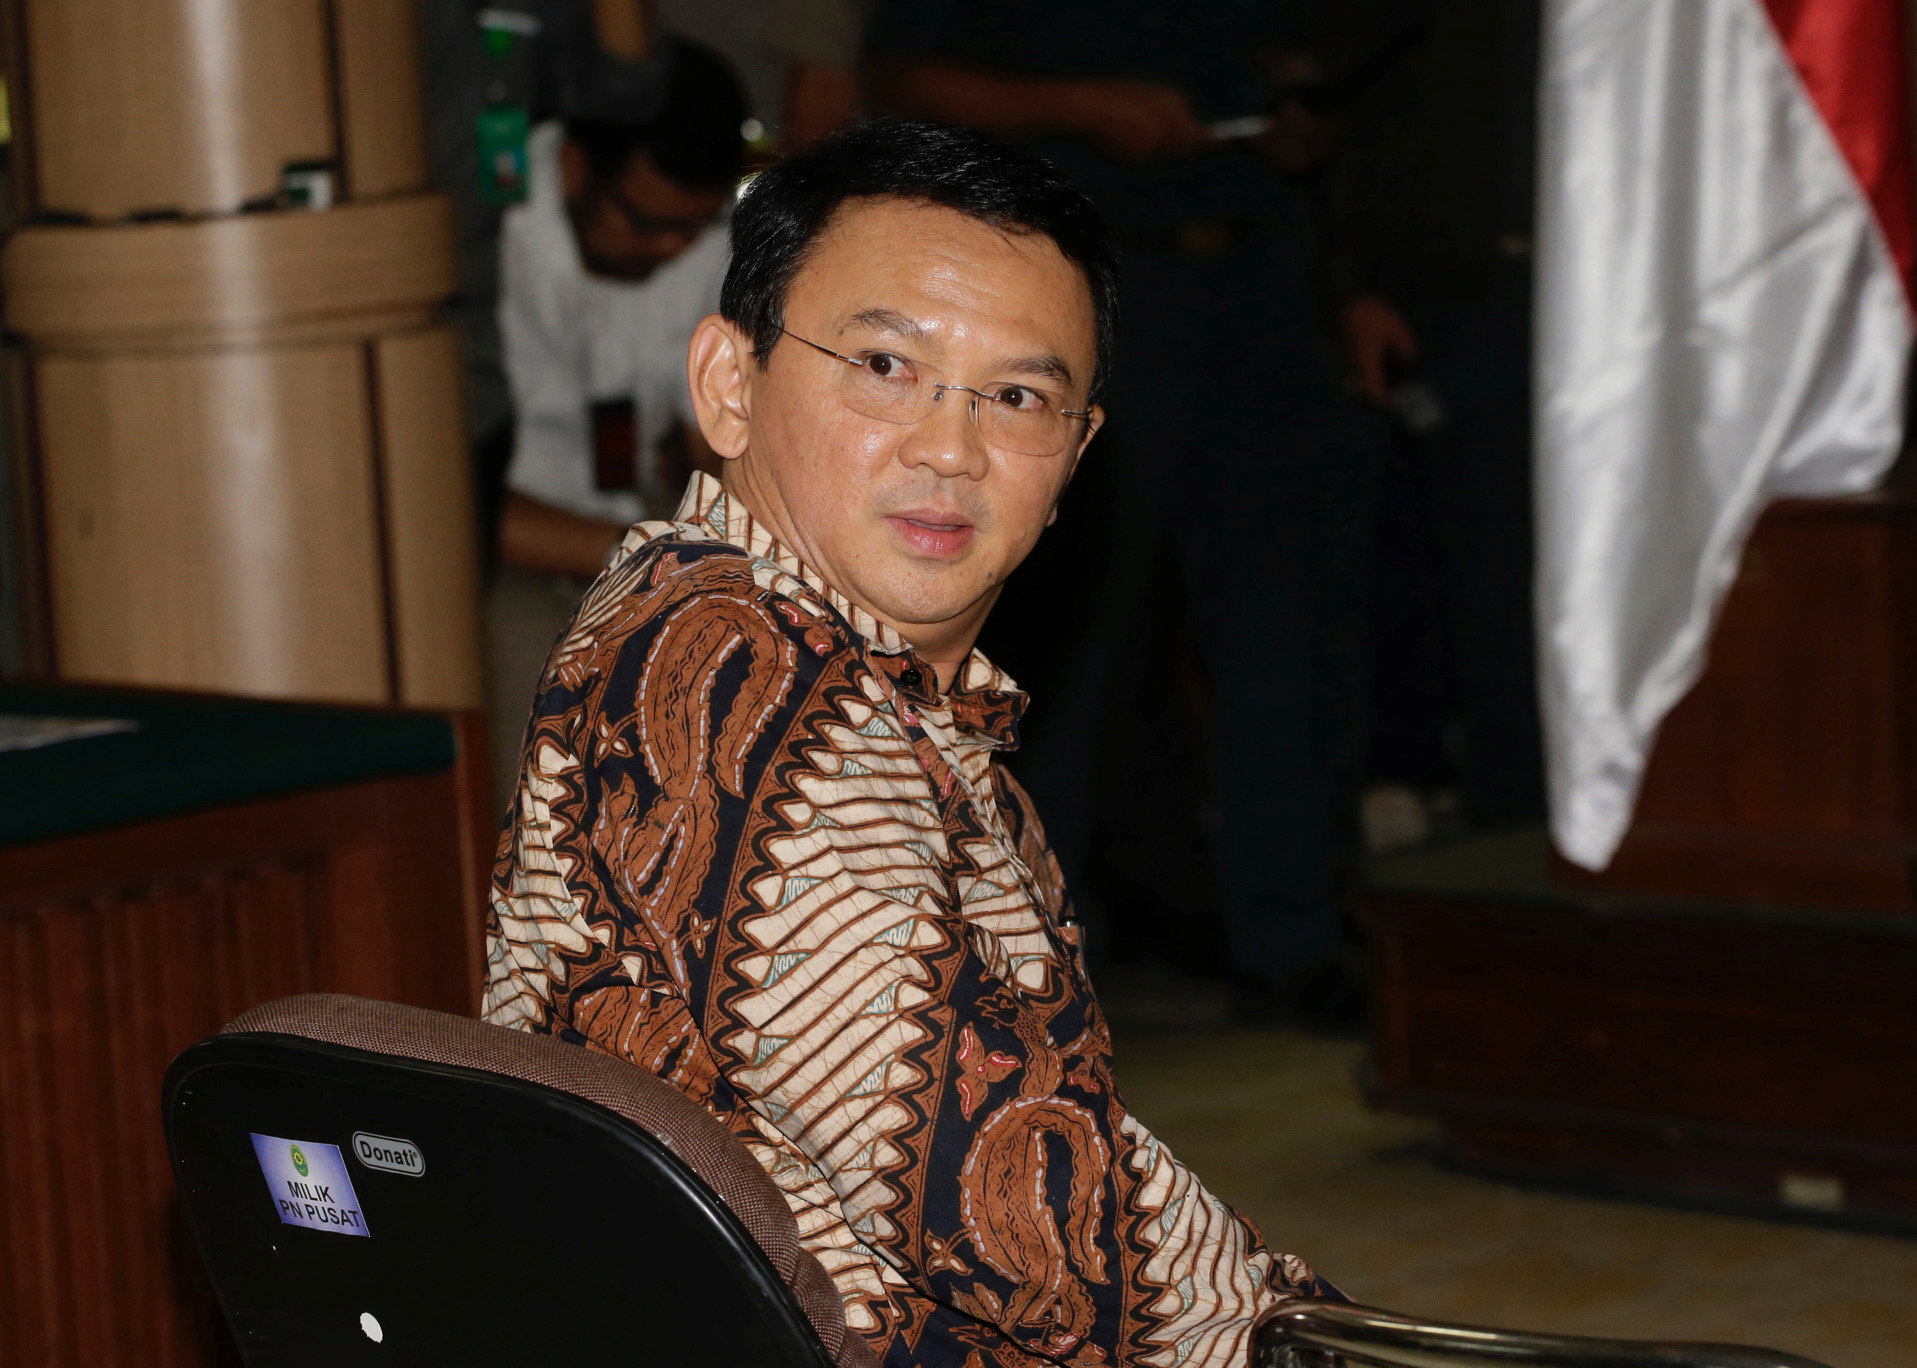 "Gubernur DKI Jakarta nonaktif Basuki Tjahaja Purnama atau Ahok menjalani sidang perdana kasus dugaan penistaan agama di PN Jakarta Utara, Selasa (13/12). ANTARA FOTO/REUTERS/Tatan Syuflana/Pool/16. *** Local Caption *** Jakarta Governor Basuki Tjahaja Purnama, popularly known as ""Ahok"", sits on the defendant's chair at the start of his trial hearing at North Jakarta District Court in Jakarta, Indonesia, Tuesday, Dec. 13, 2016. ANTARA FOTO/REUTERS/Tatan Syuflana/Pool/16."